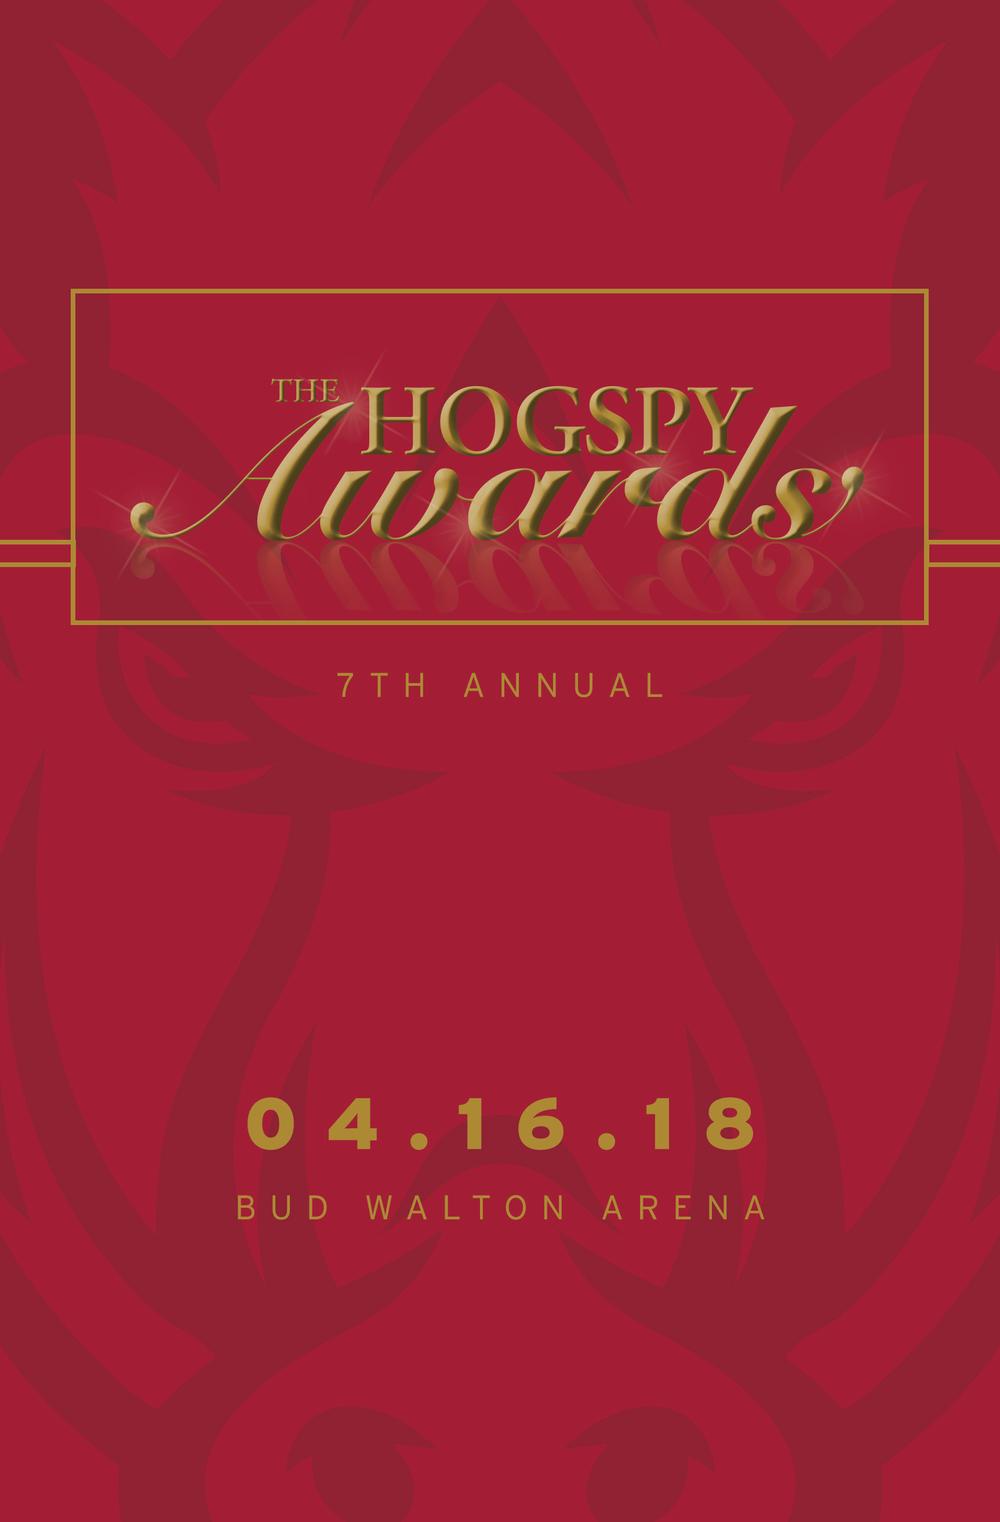 2018 HOGSPY Event Program_Page_01.png